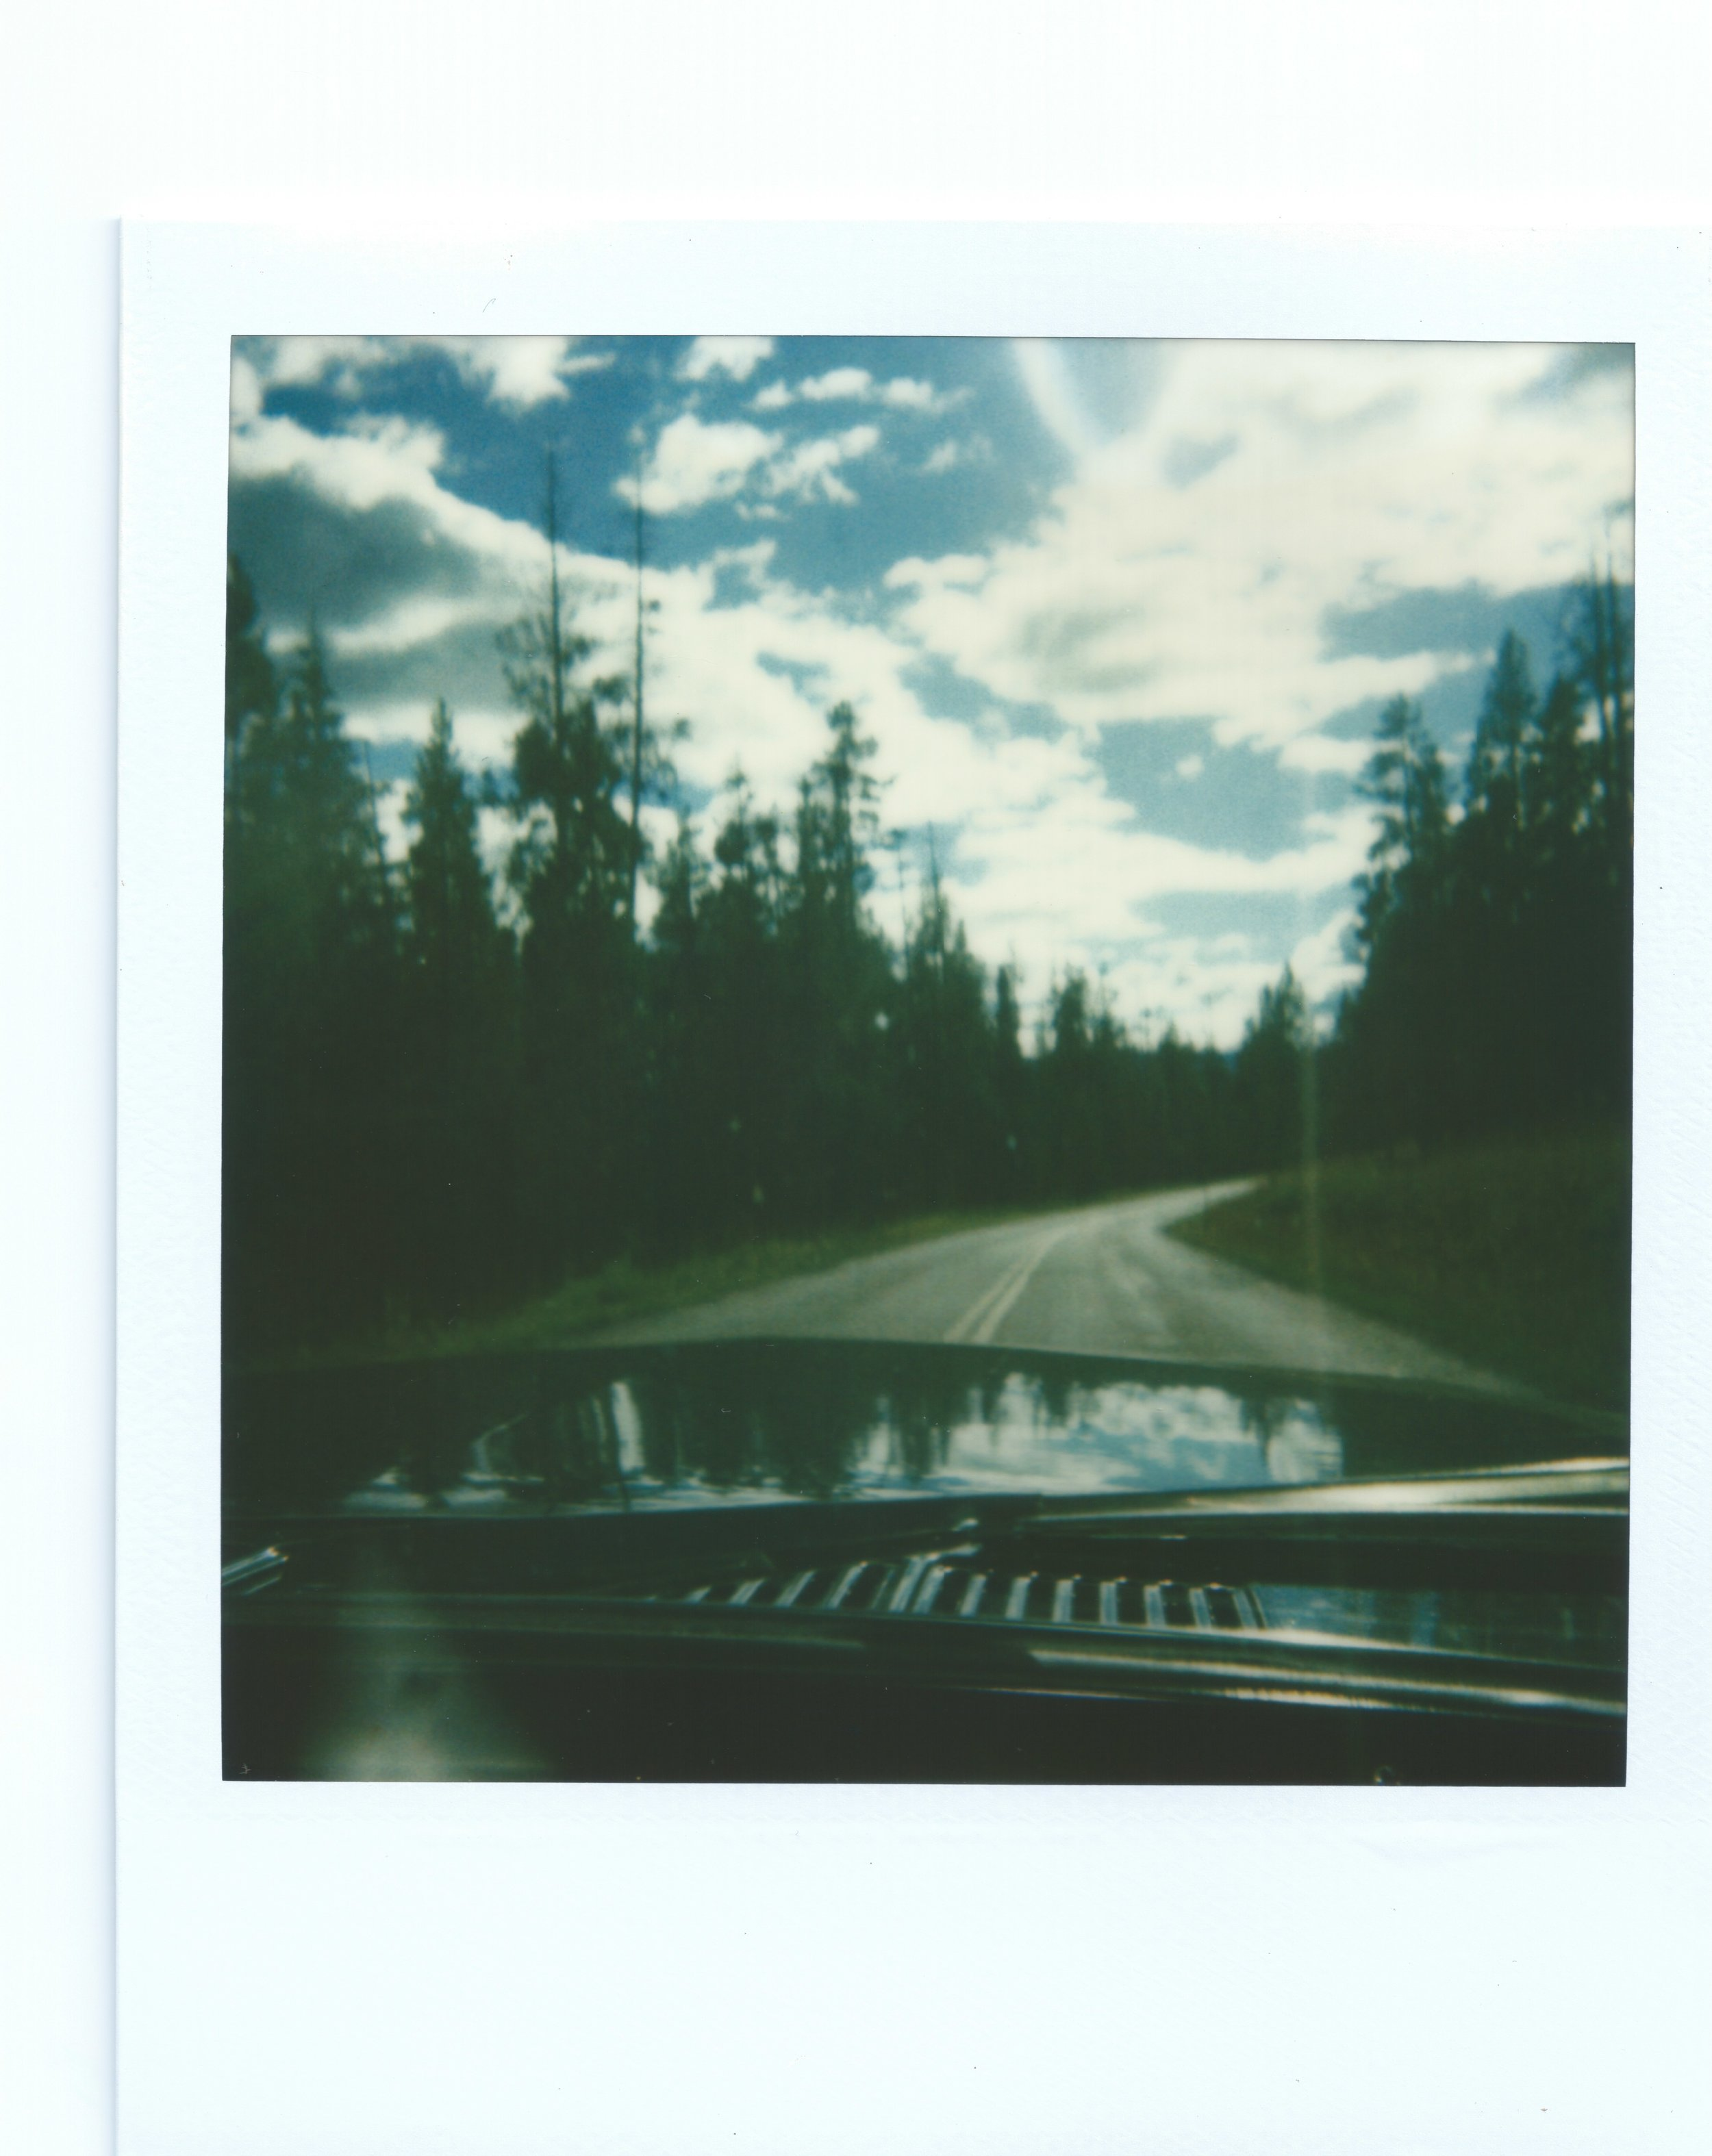 Road_pinetrees_binder6.jpeg